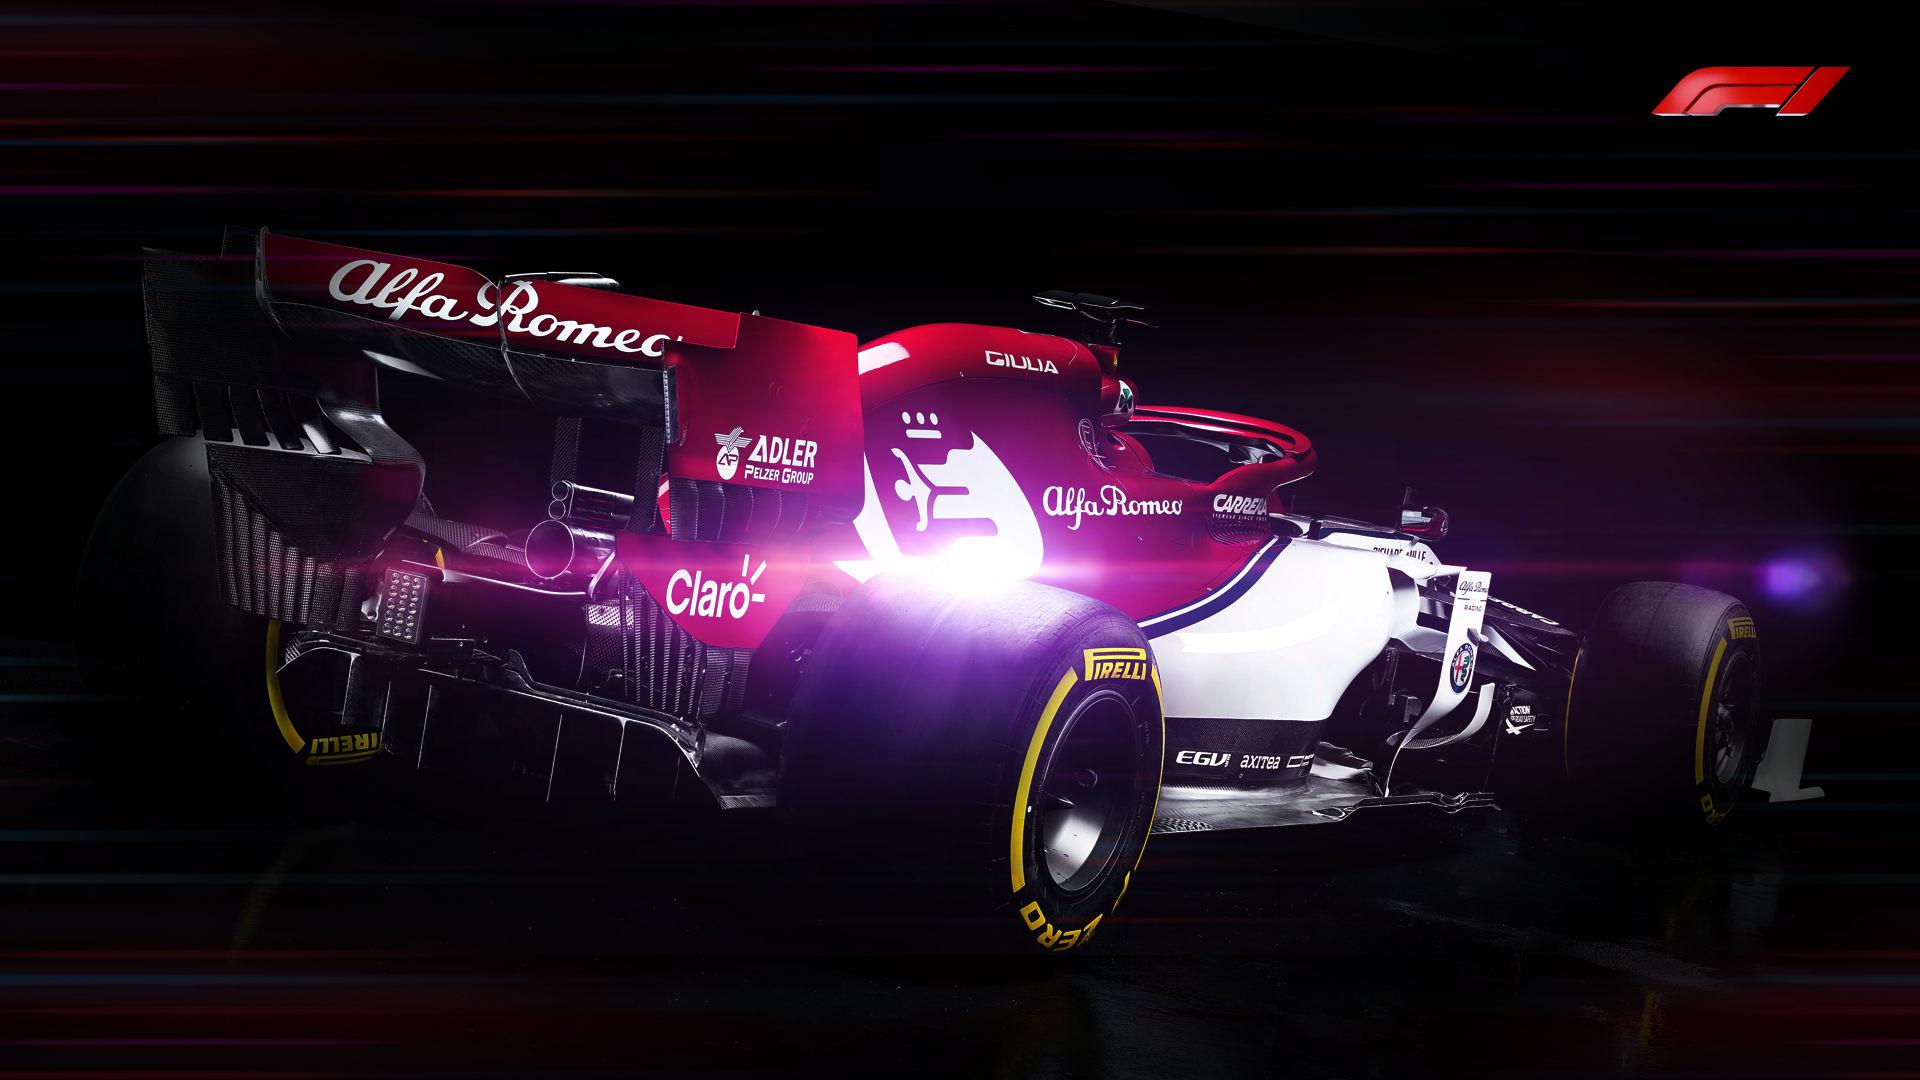 Alfa Romeo F1 2020 Car Wallpaper Hd